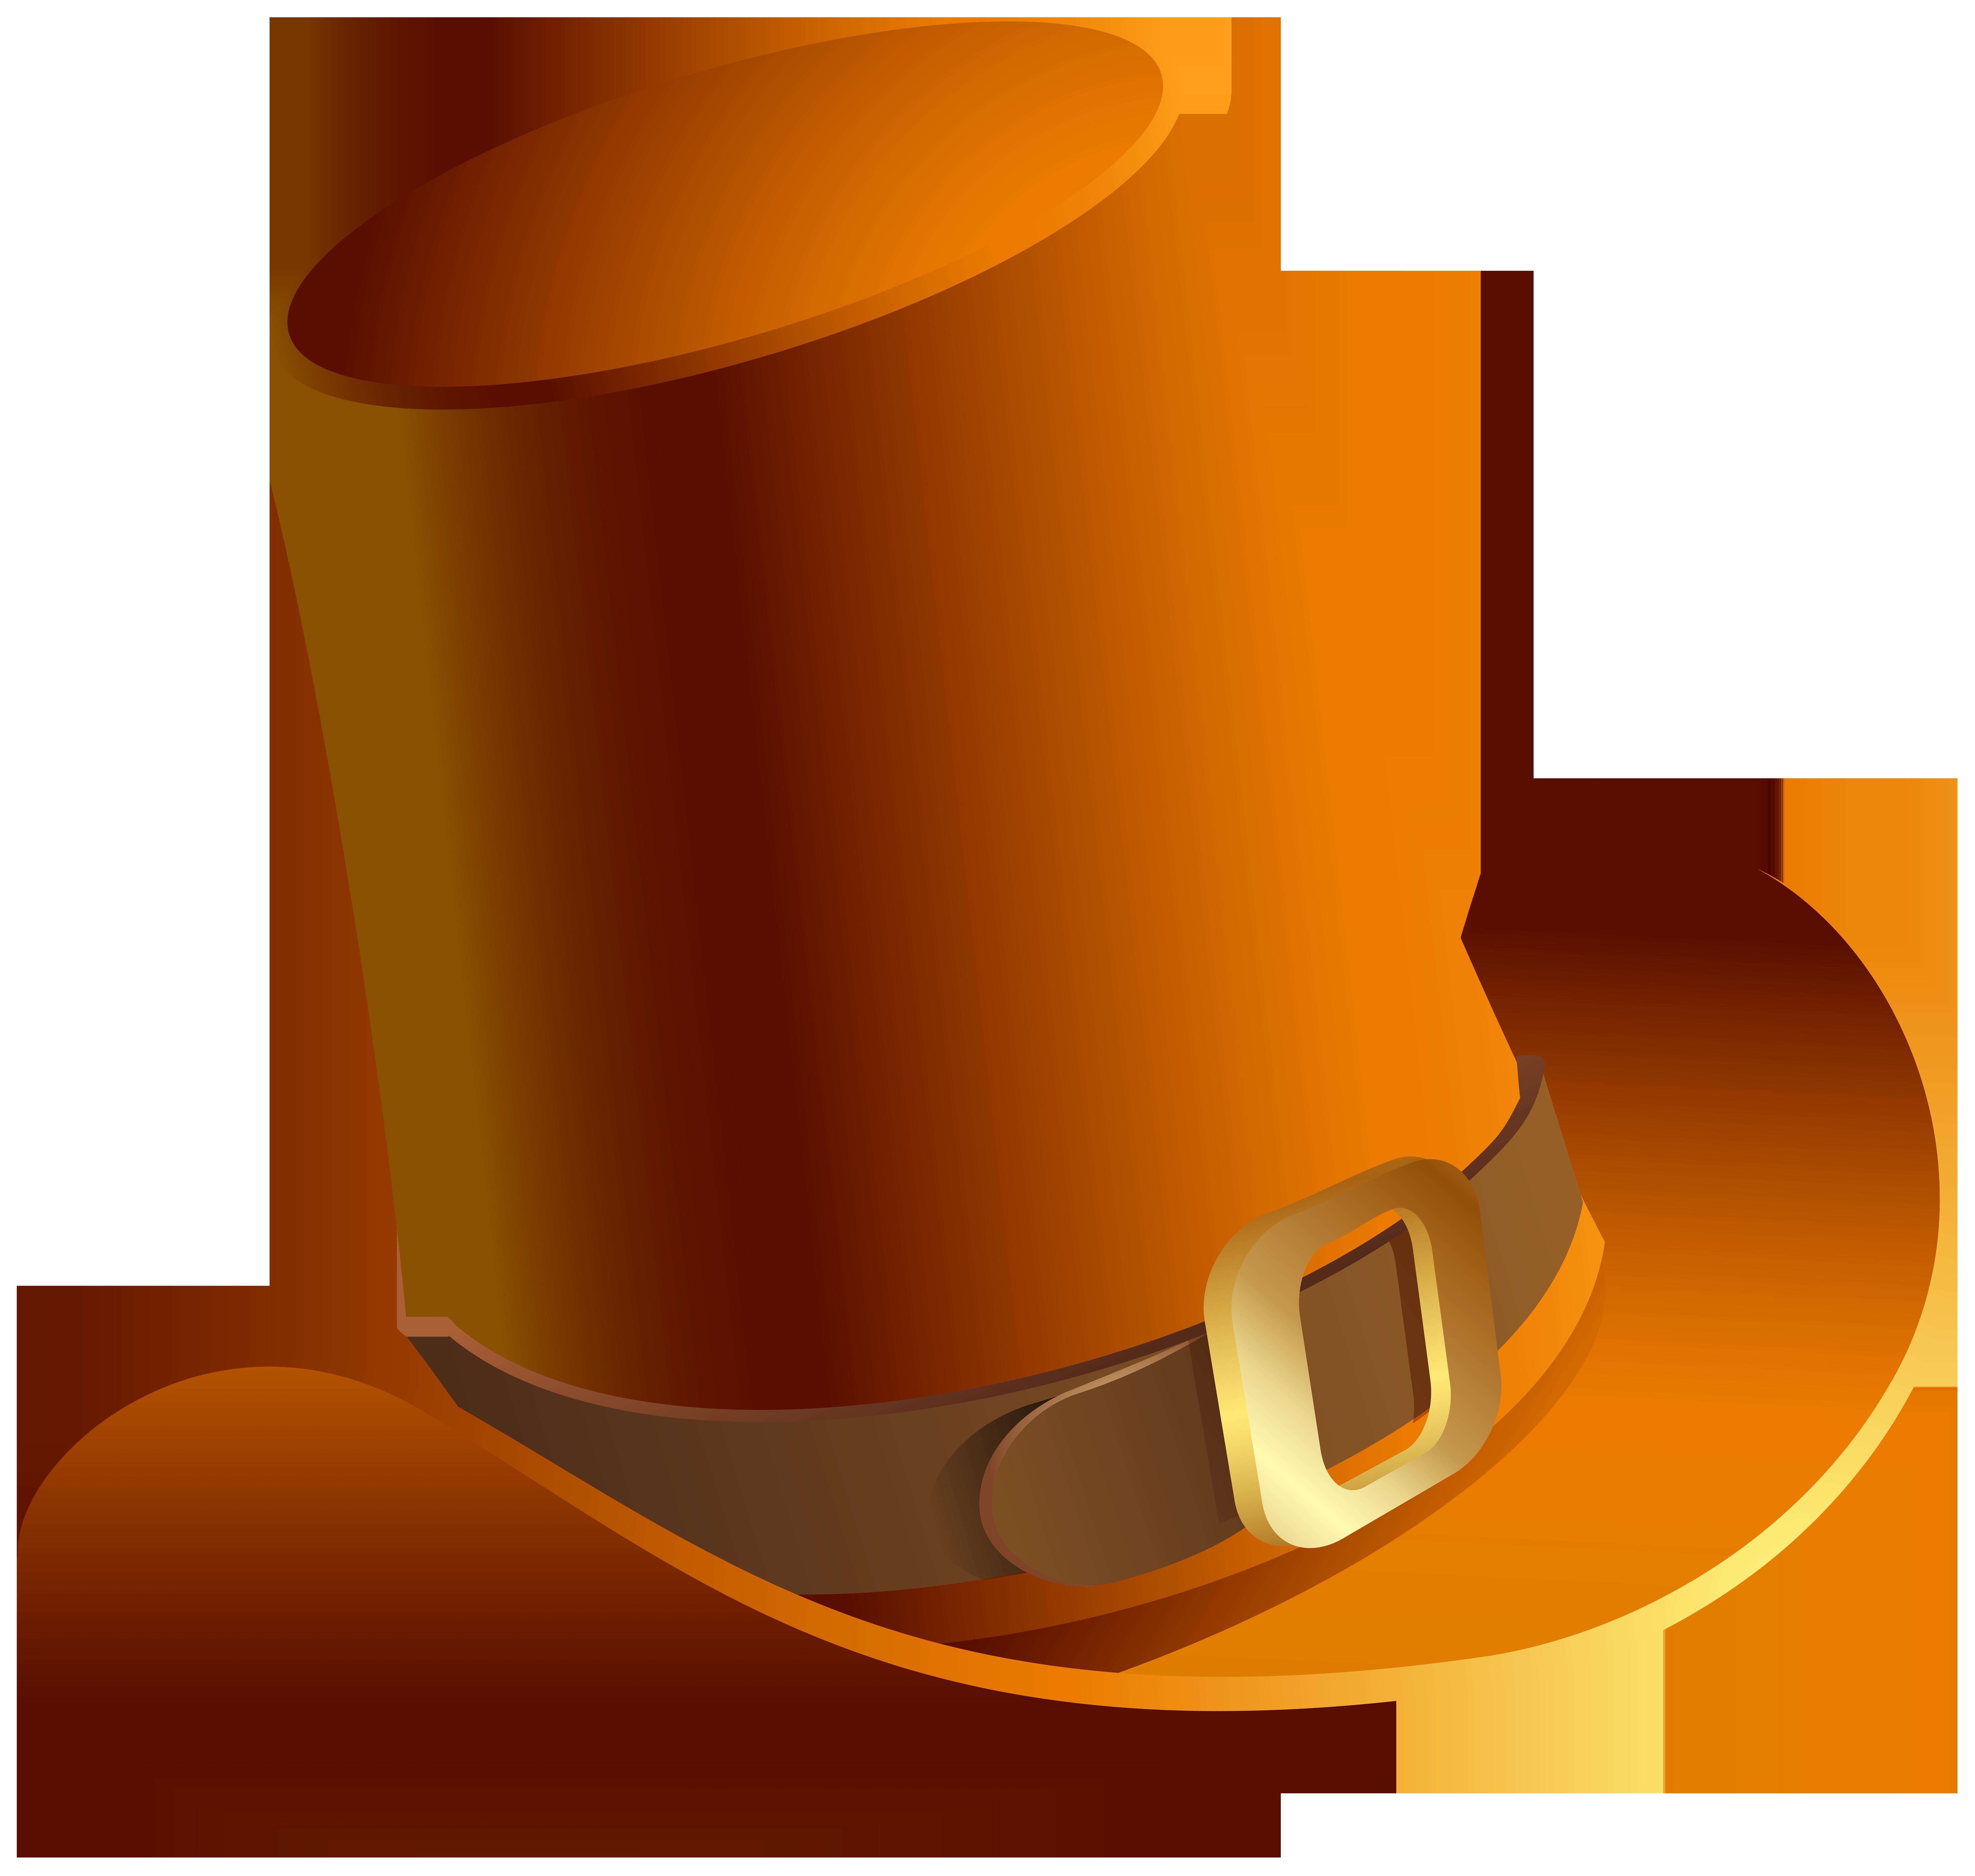 Pilgrim clipart pilgrim hat. Brown transparent png image